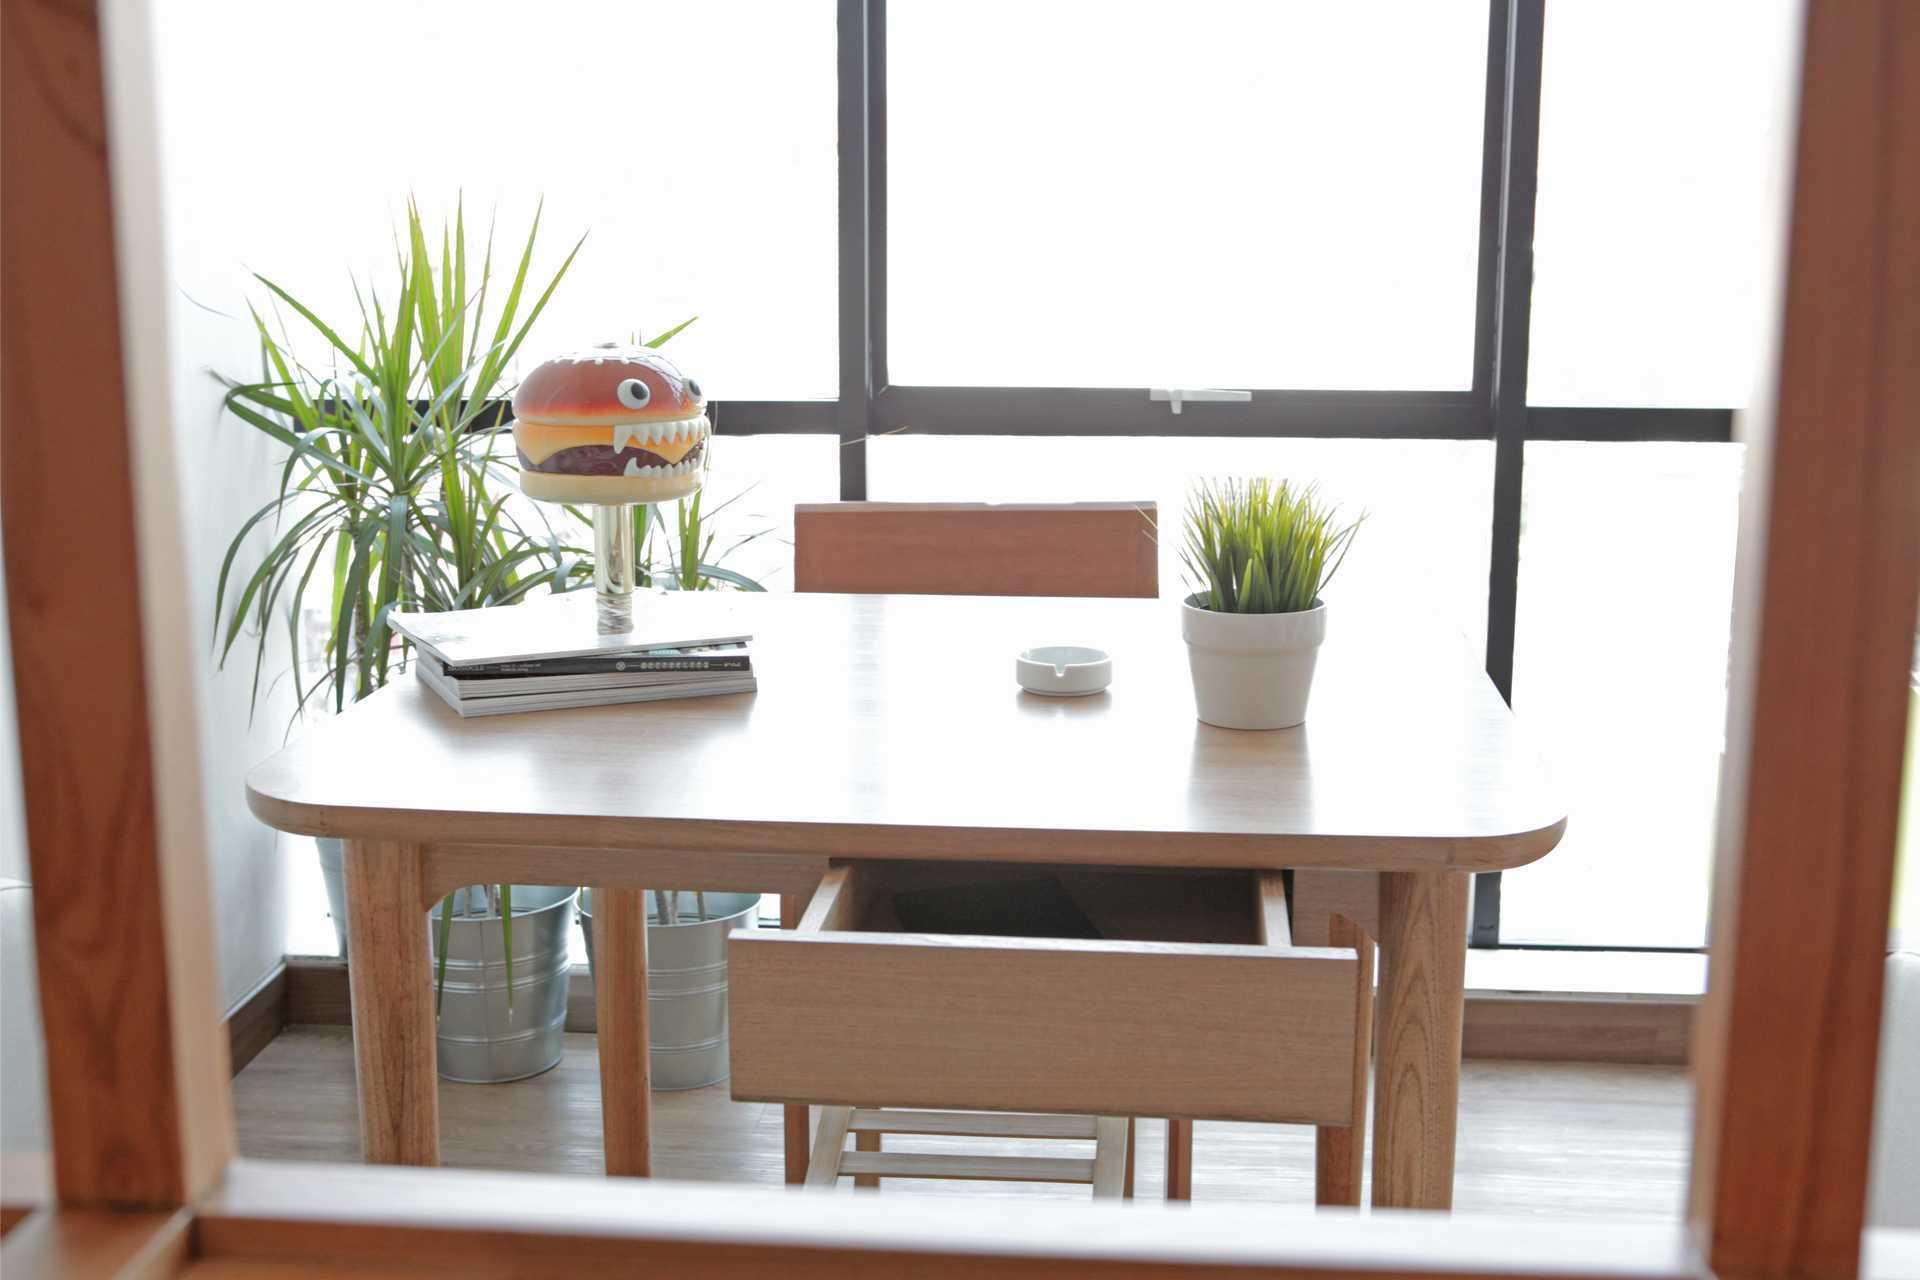 Design & Build By Fabelio.com Table Six Design Studio Jalan Kemang Timur No.69E, Mampang Prapatan, Rt.4/rw.3, Bangka, Mampang Prpt., Kota Jakarta Selatan, Daerah Khusus Ibukota Jakarta 12730, Indonesia Jalan Kemang Timur No.69E, Mampang Prapatan, Rt.4/rw.3, Bangka, Mampang Prpt., Kota Jakarta Selatan, Daerah Khusus Ibukota Jakarta 12730, Indonesia Working Area Minimalist 53962